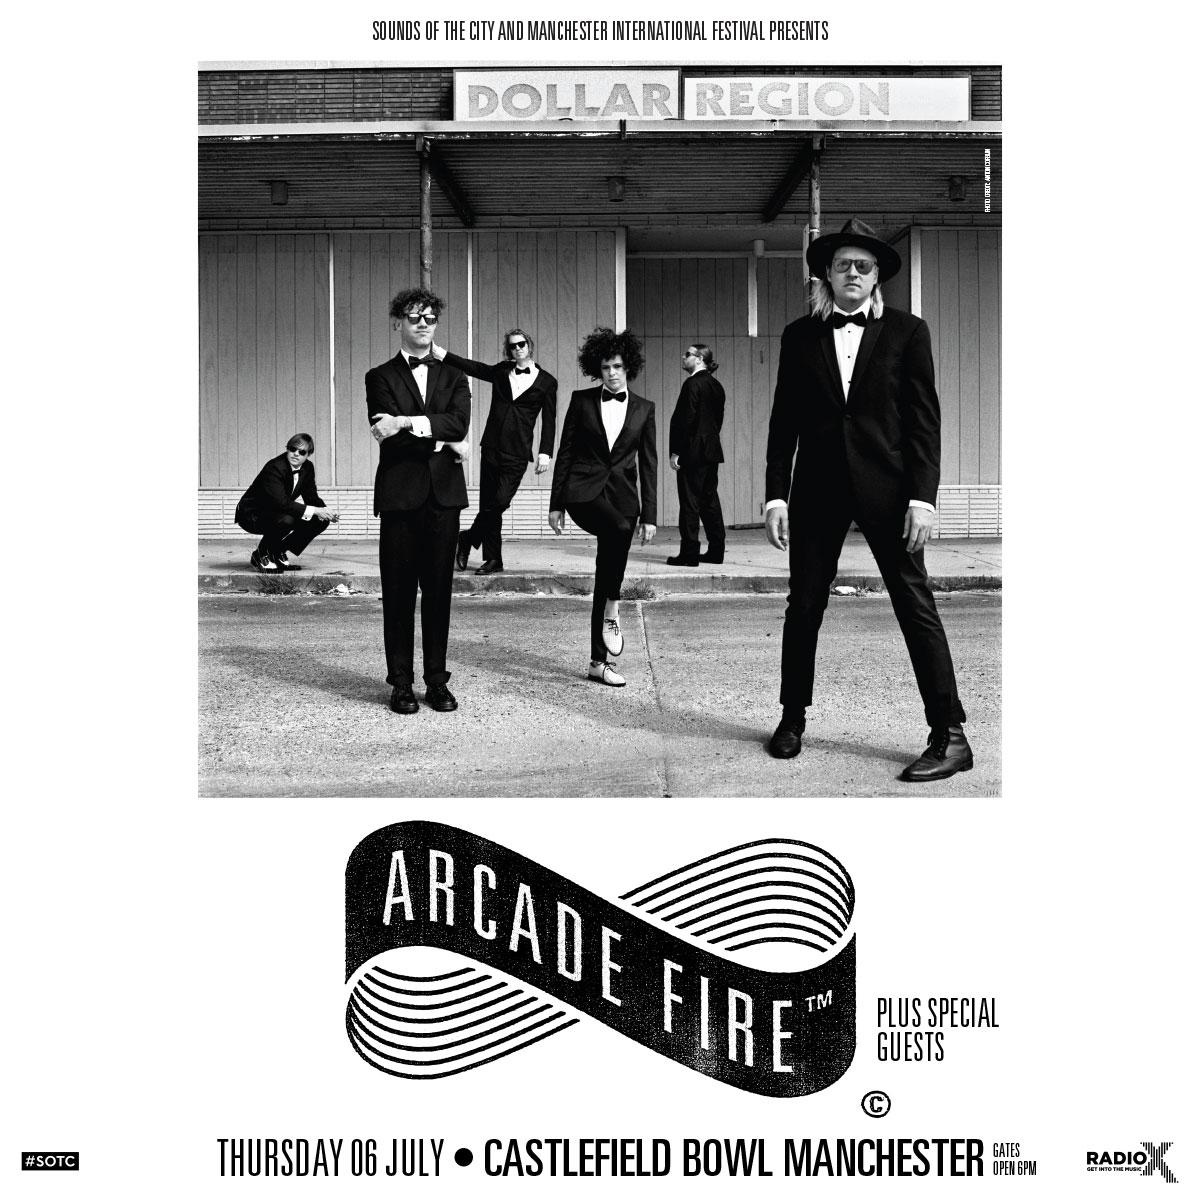 Arcade Fire SOTC 2017 poster